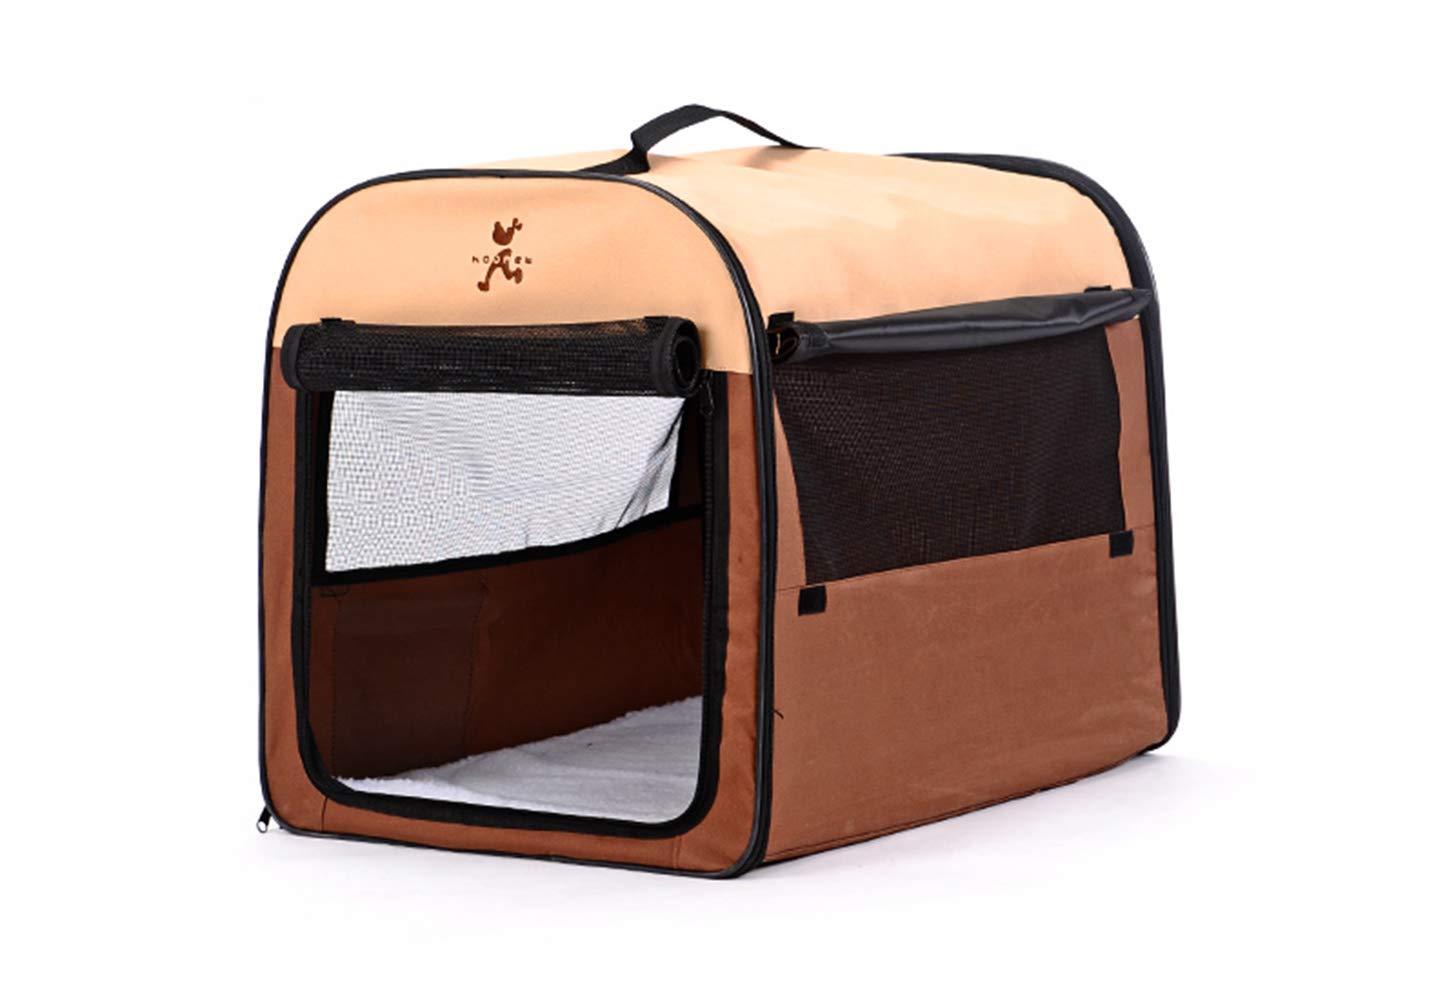 Medium WeRui Portable Soft Fabric Pet Carrier Folding Dog Cat Puppy Travel Bed Cozy Pets Hut House Travel Basket